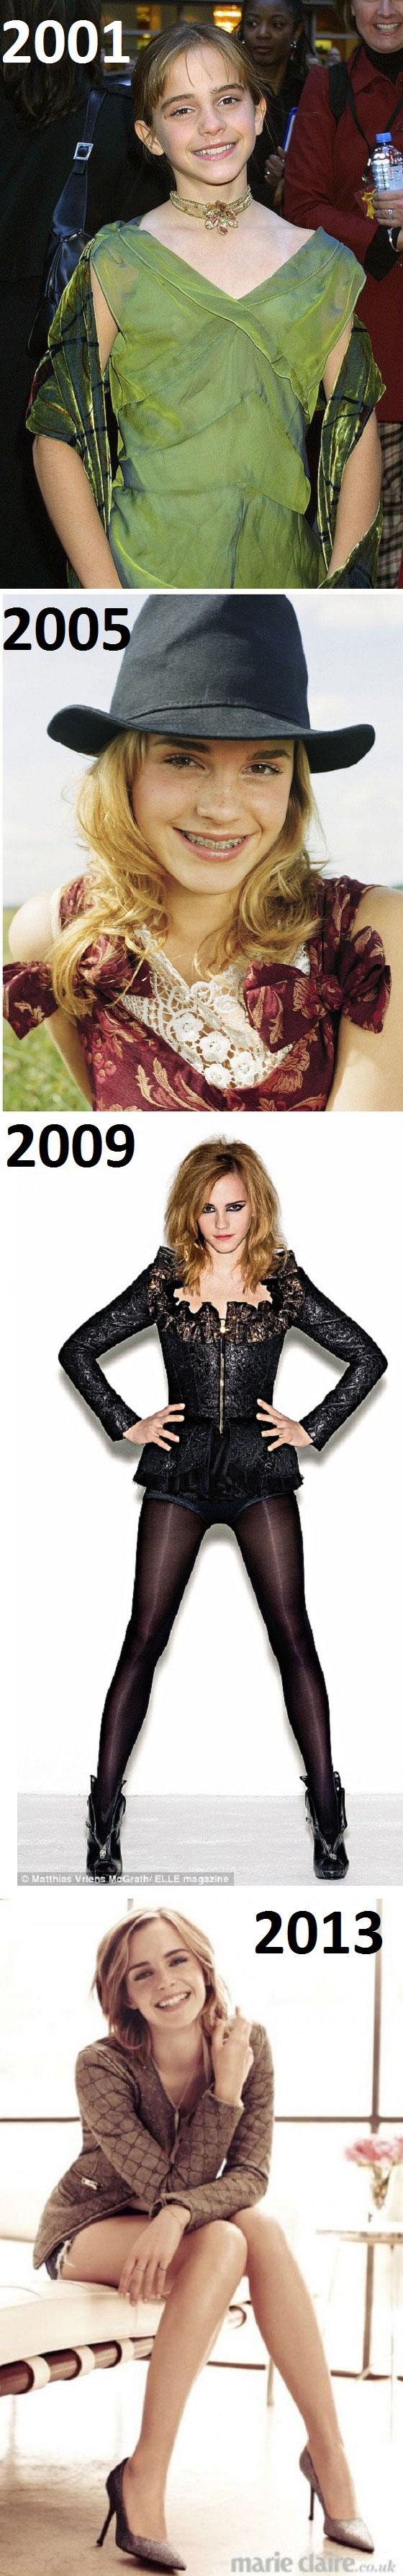 emma watson, evolution, 2001, 2005, 2009, 2013